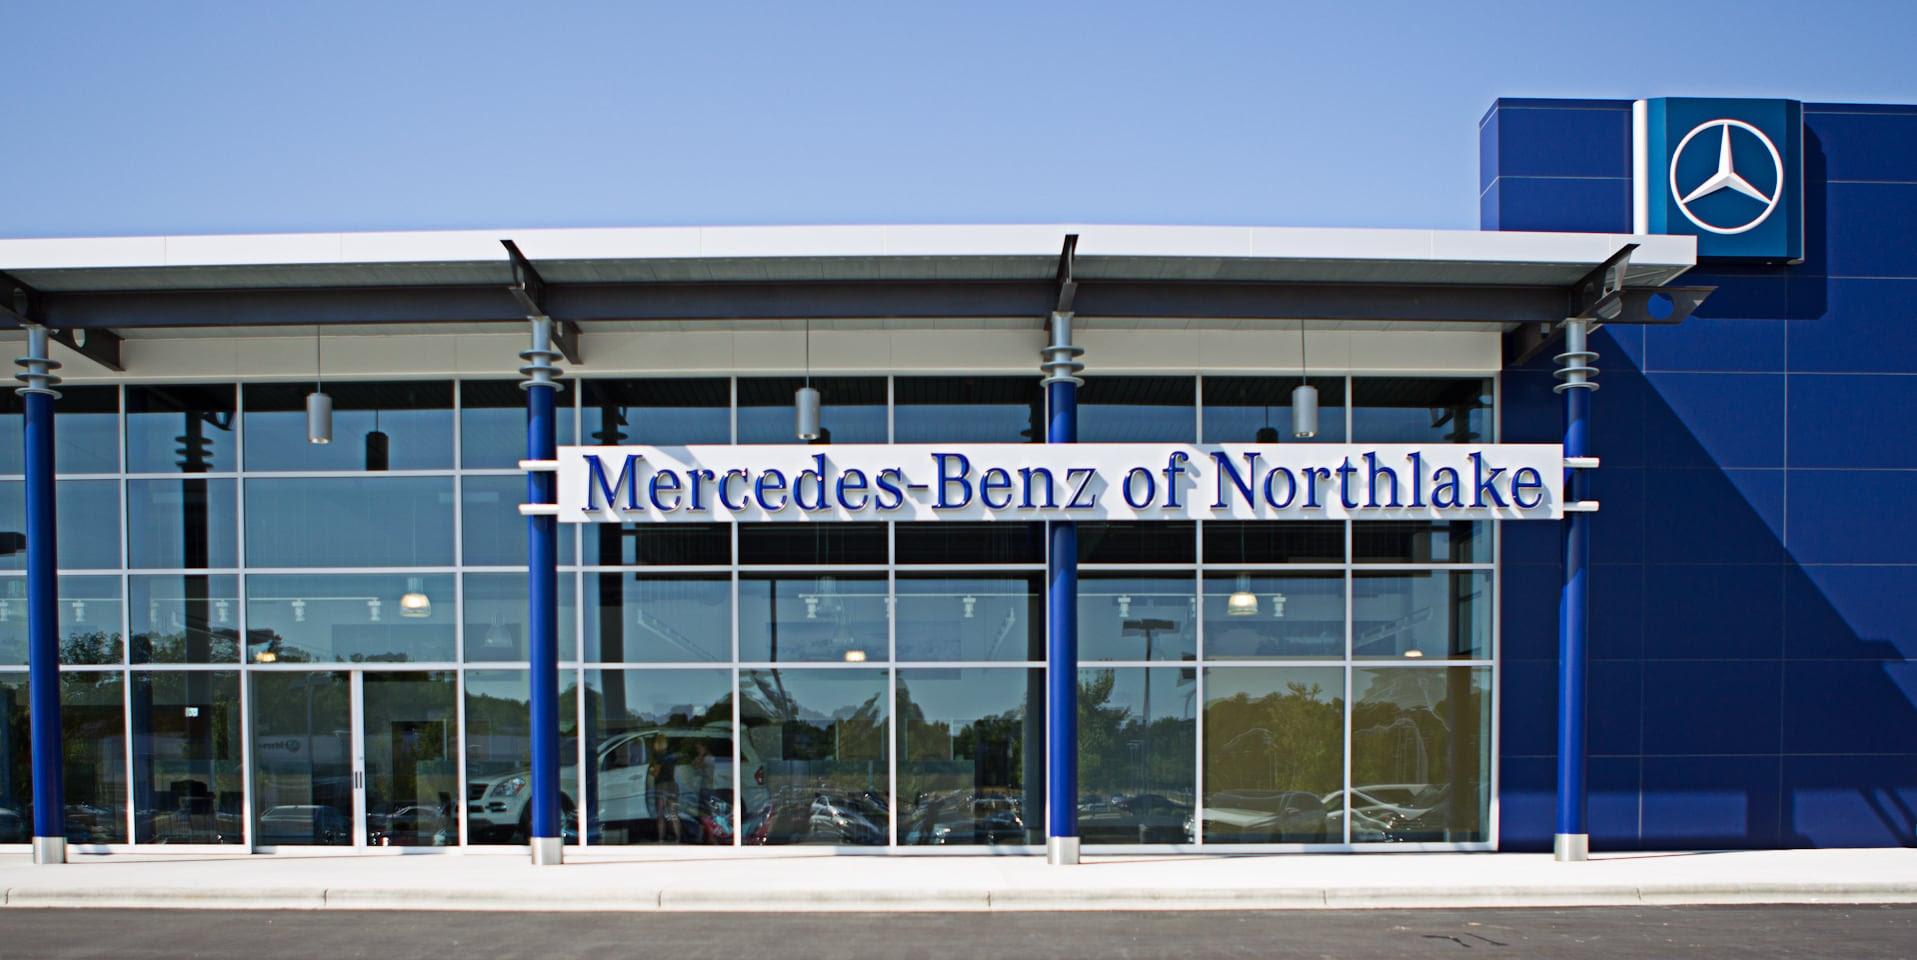 U Haul Self Storage: Hendrick Mercedes Northlake